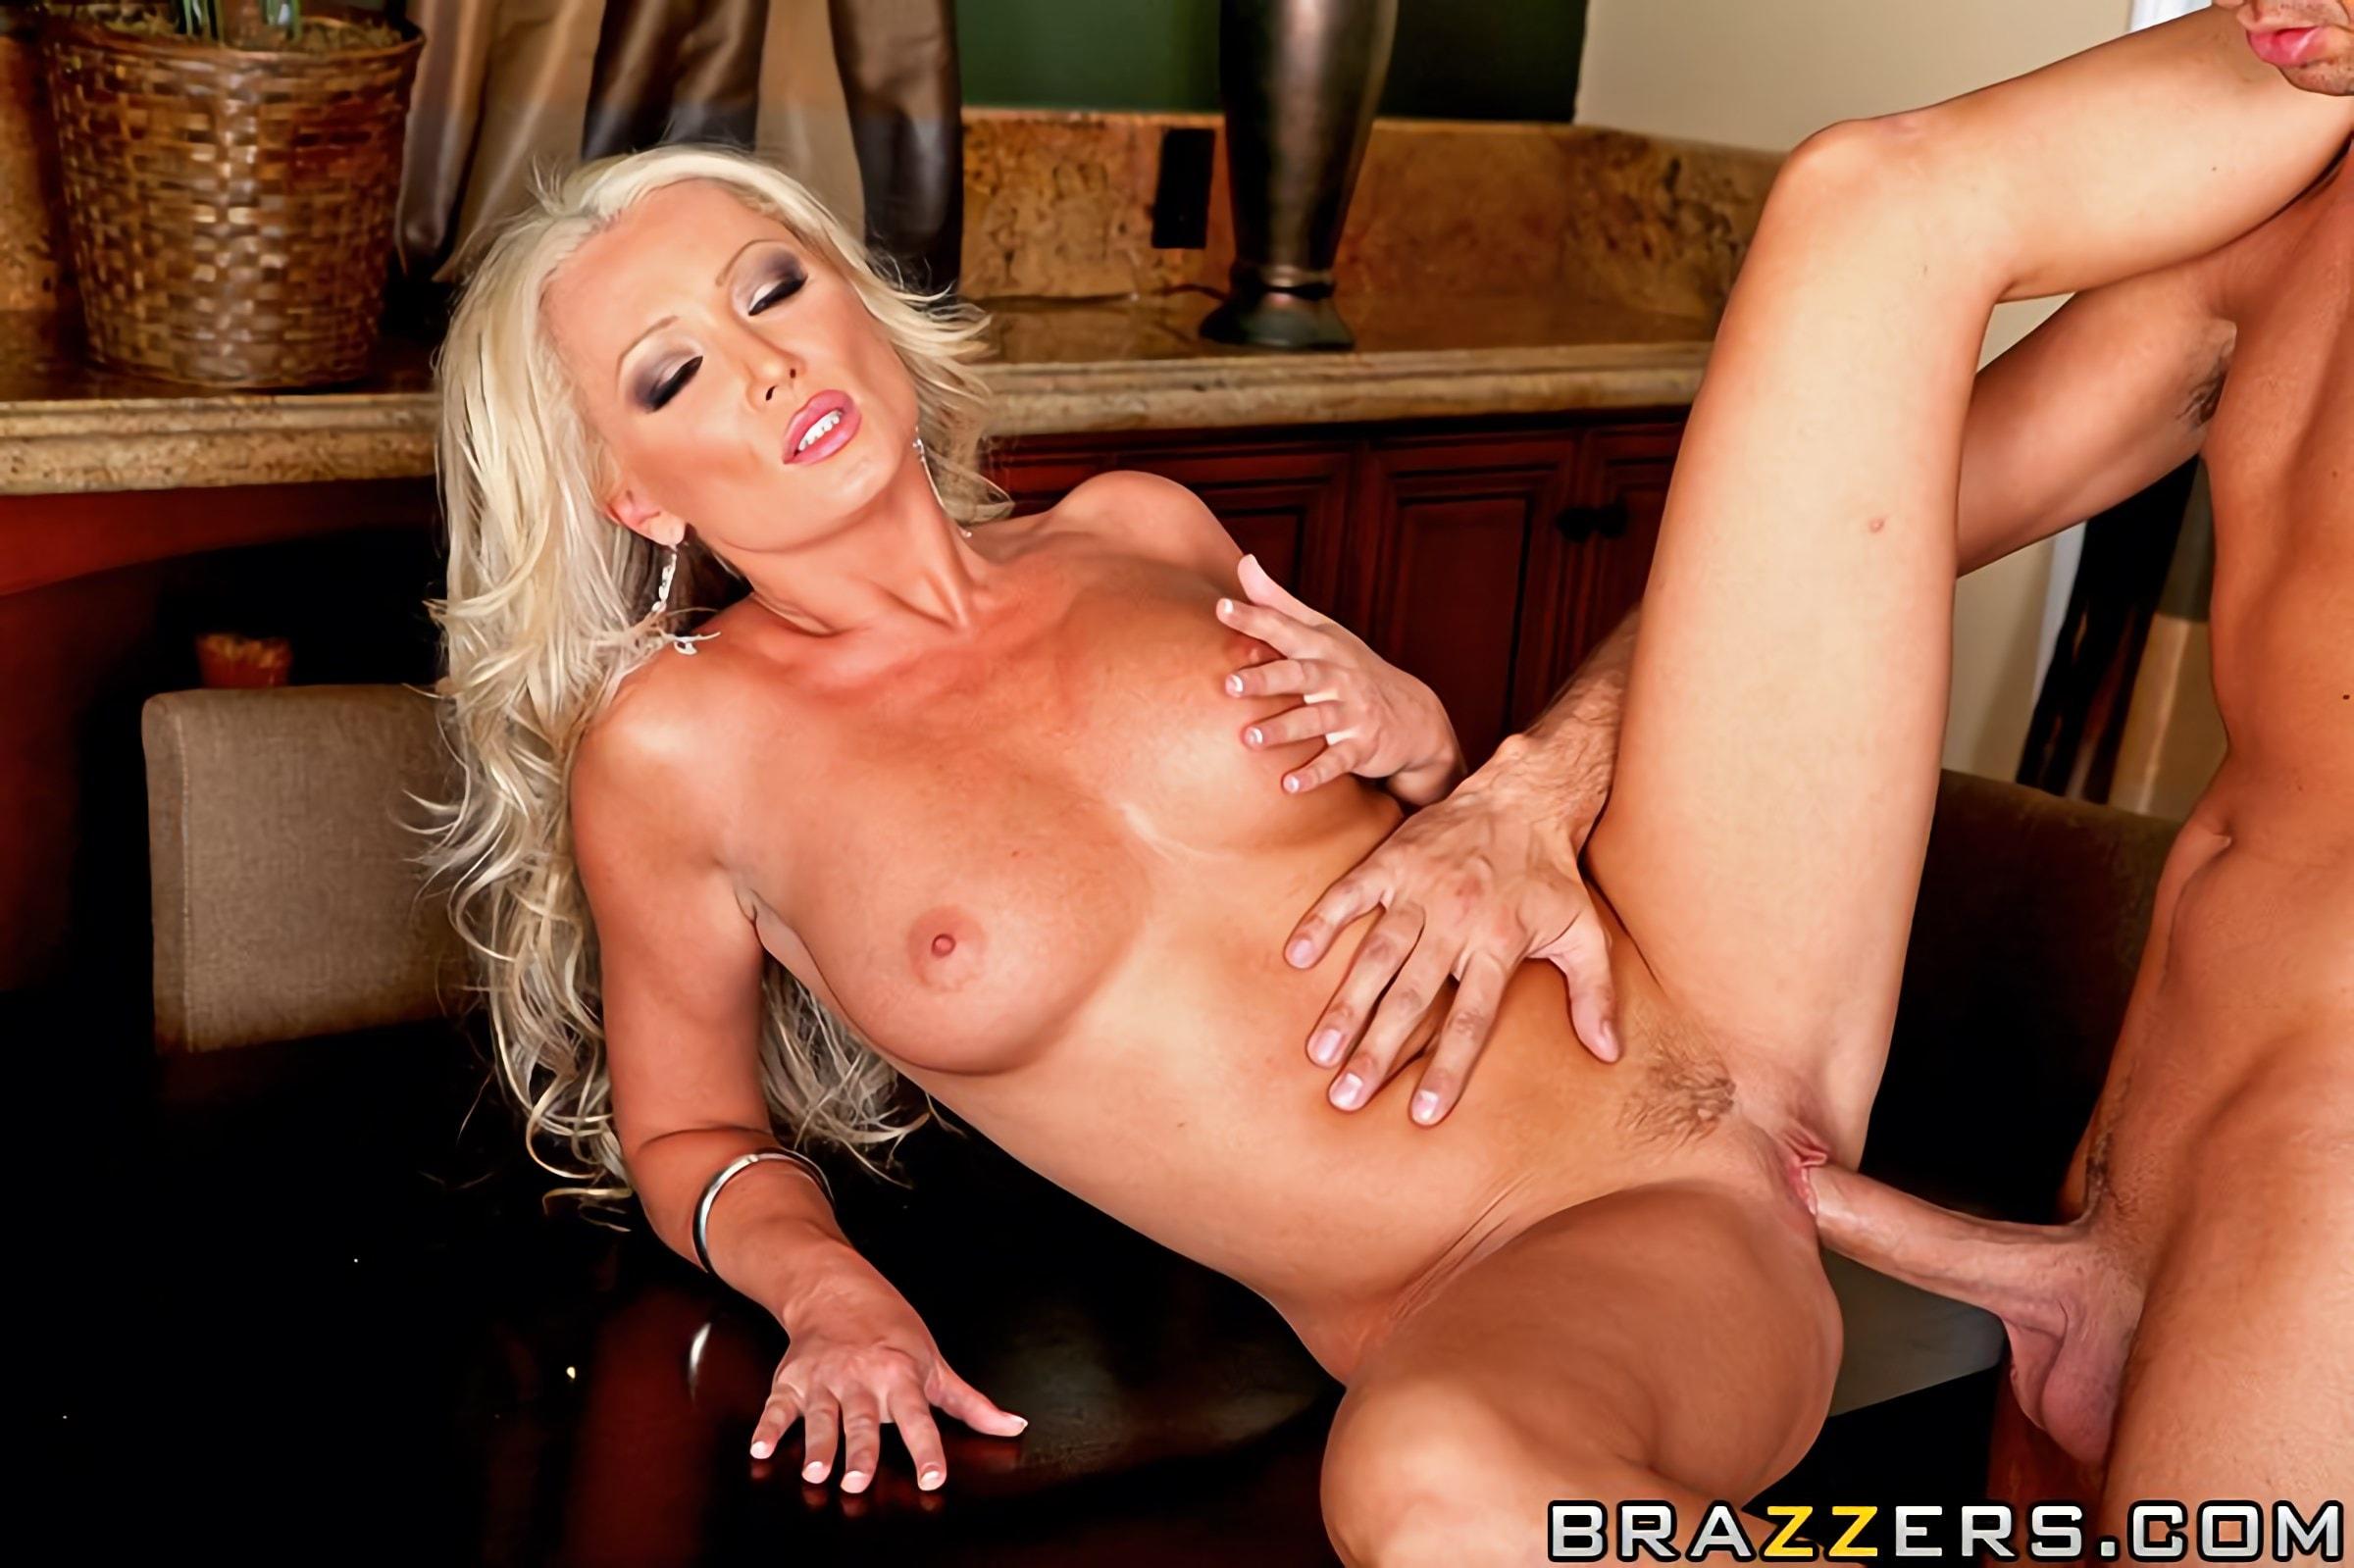 Diana doll порно видео хотел